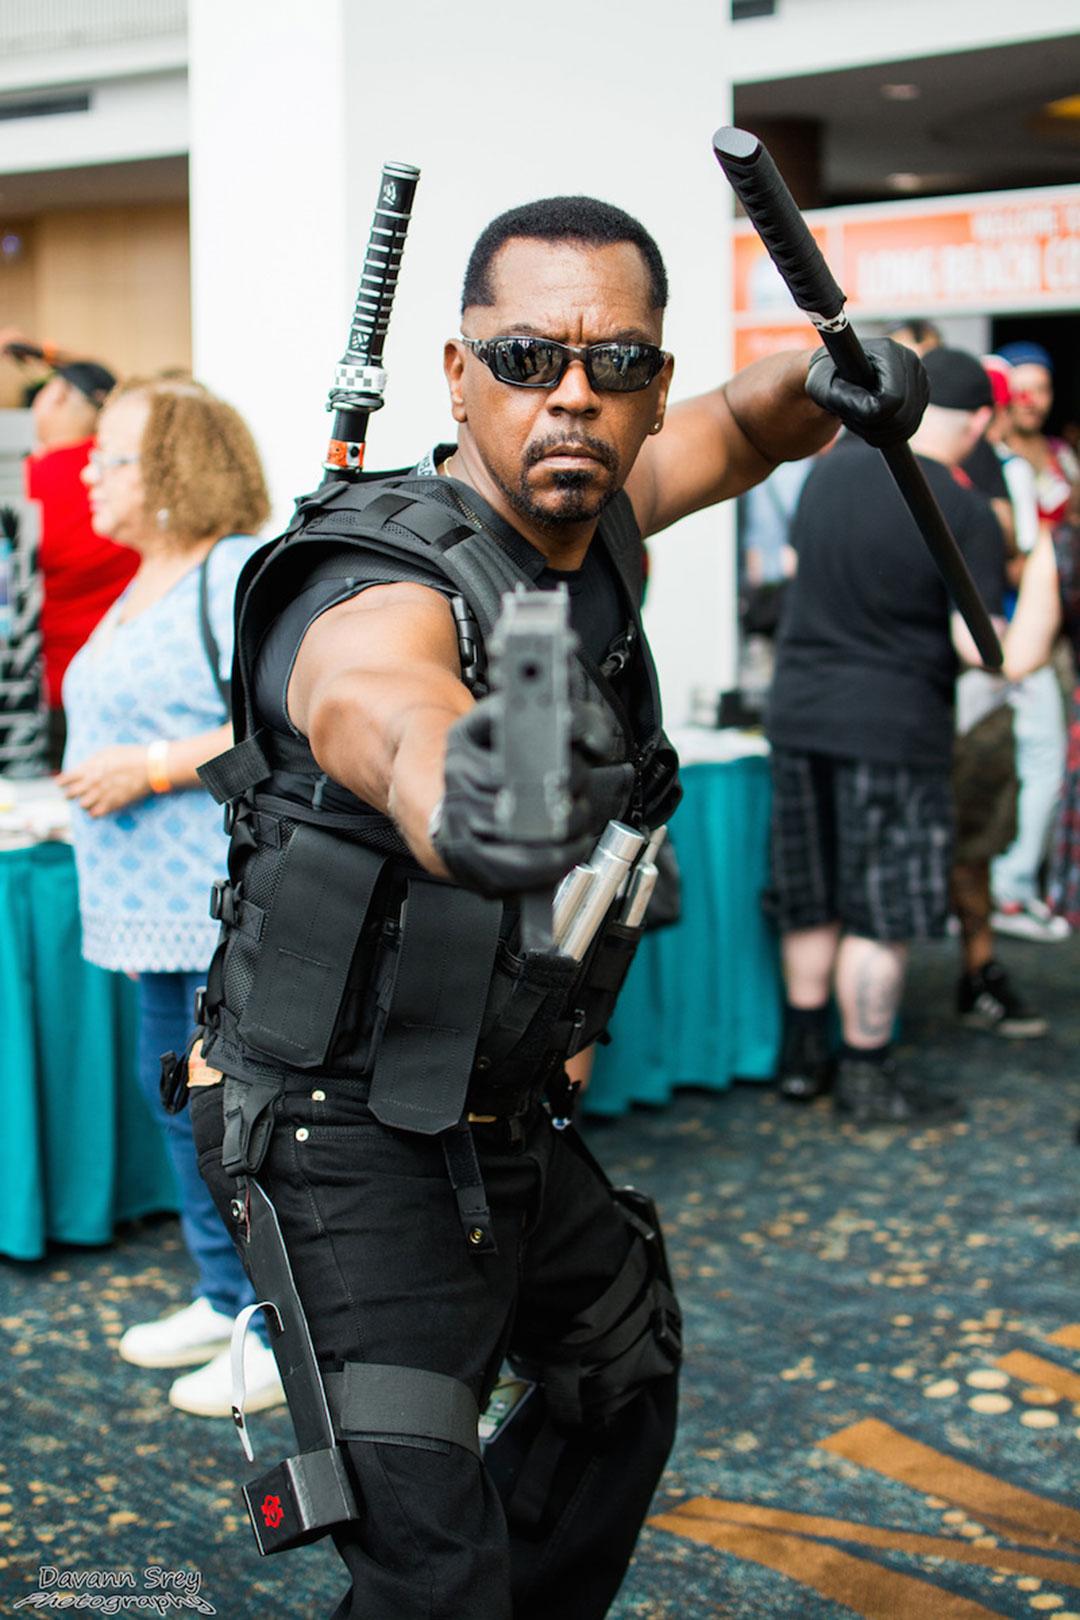 Cosplay-Comic-Con-(38)